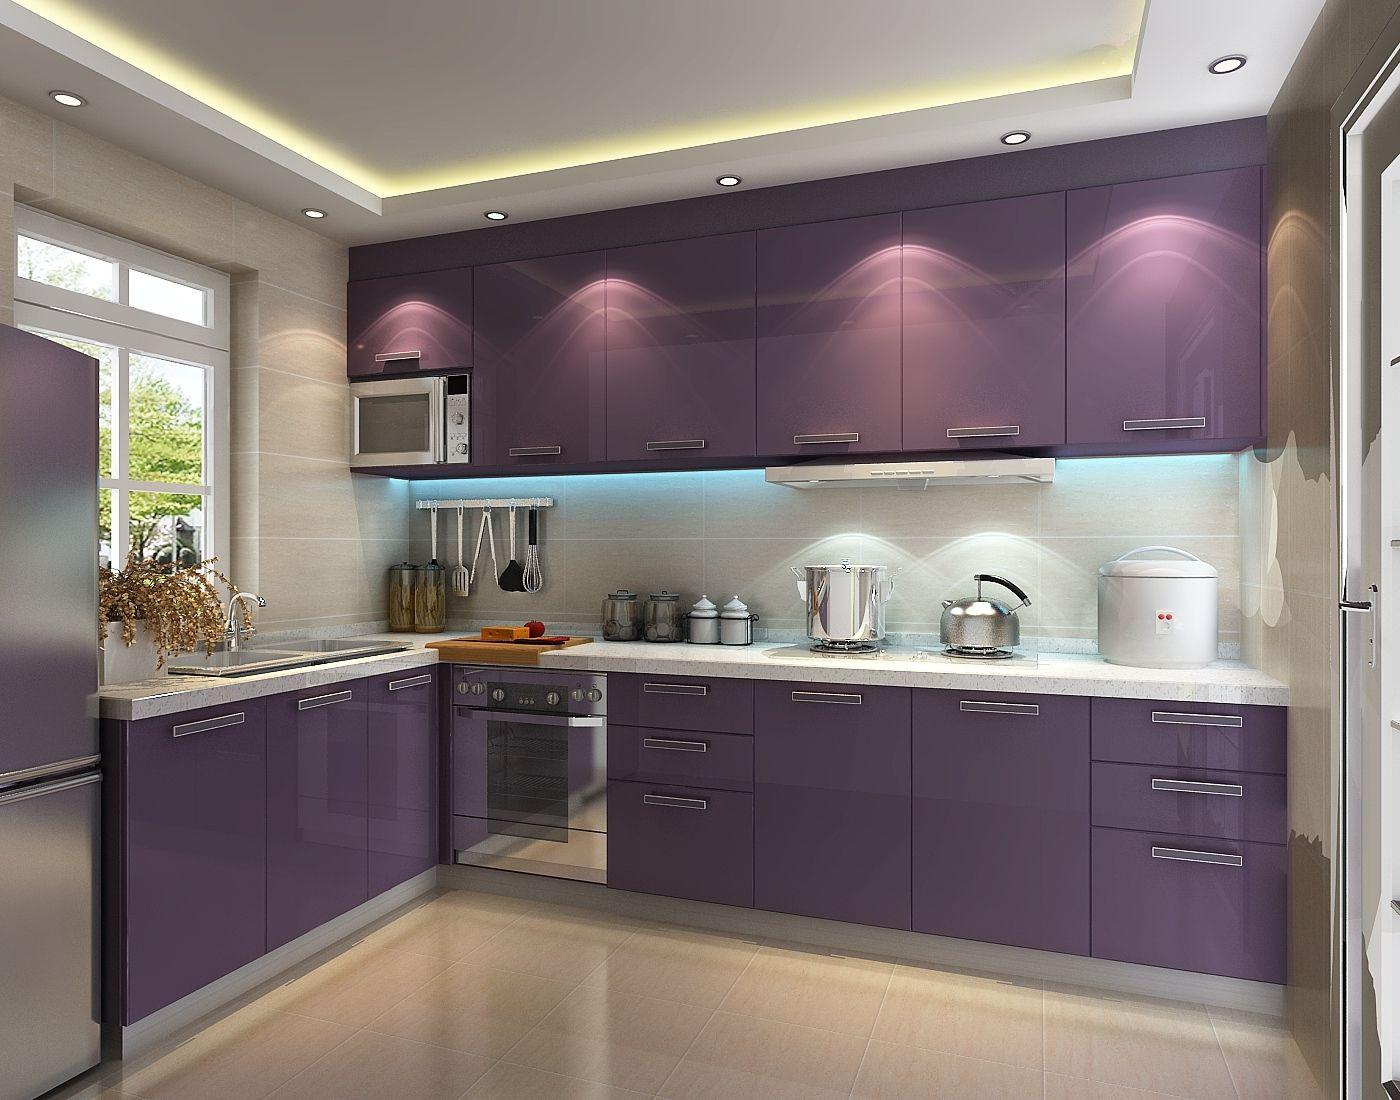 exclusive wonderful purple kitchen ideas | Purple East Gloss Kitchen Cabinet Extraordinary Modern ...